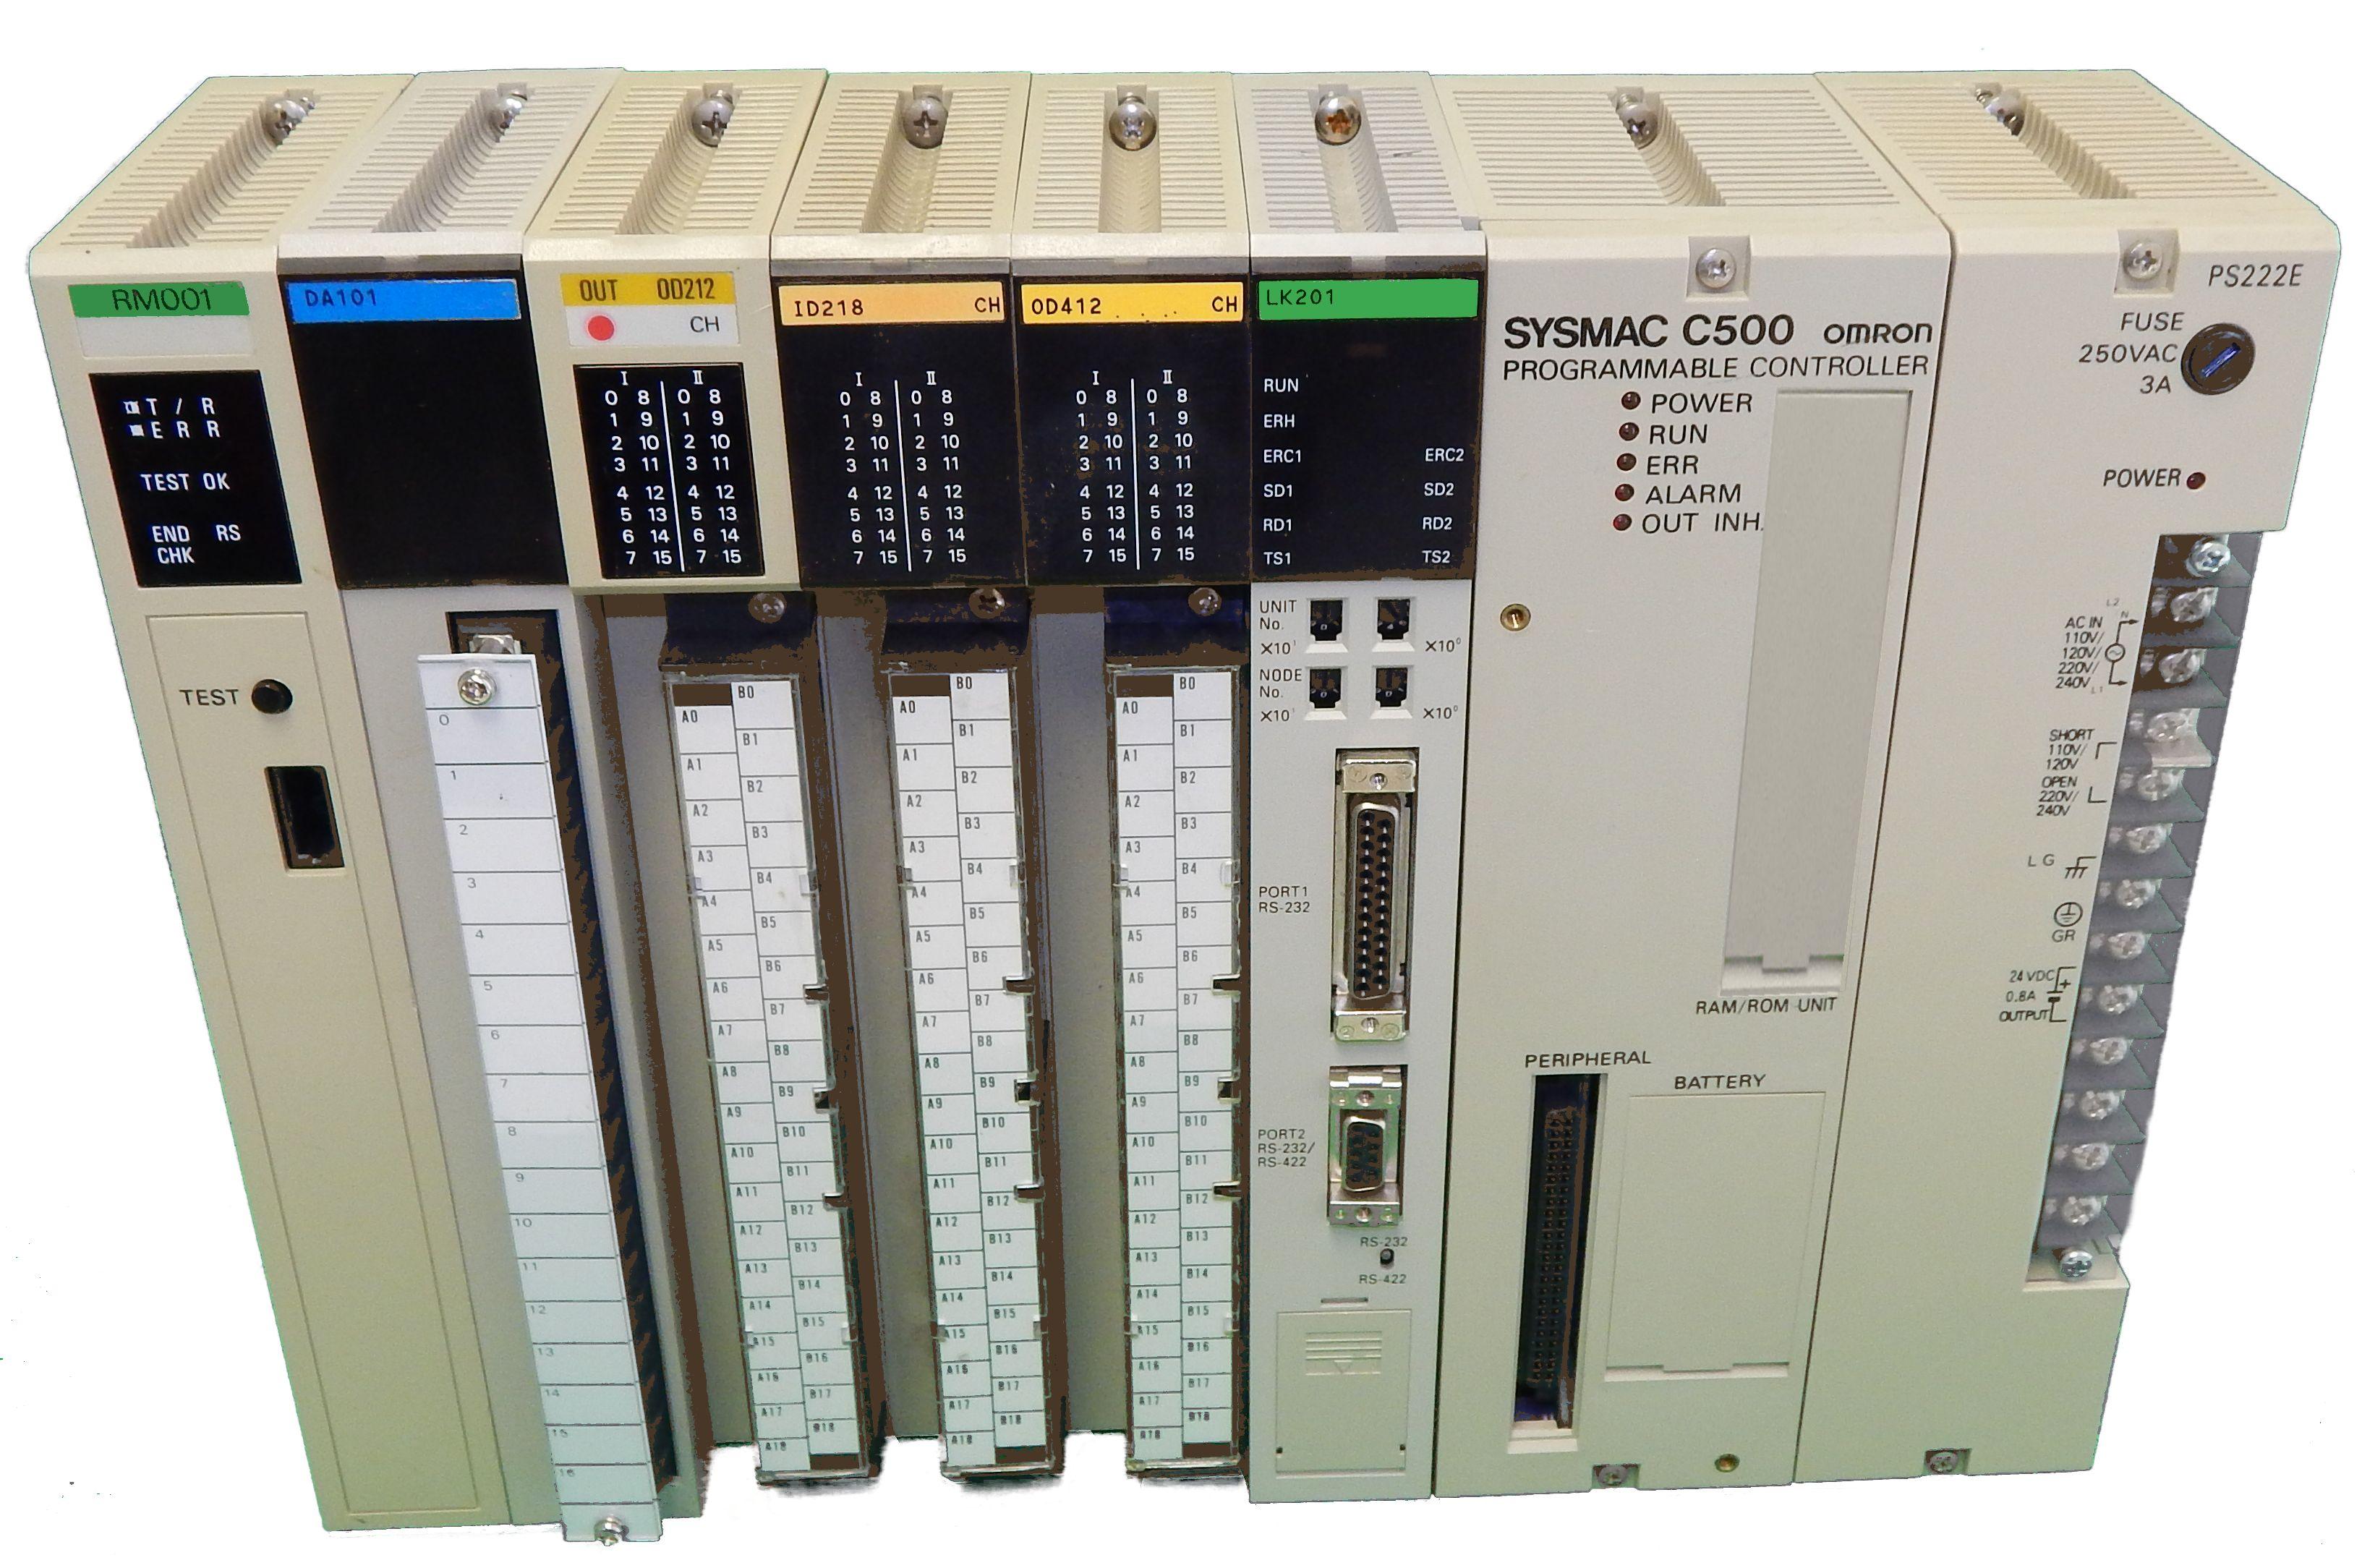 3G2C7-CPU74-E